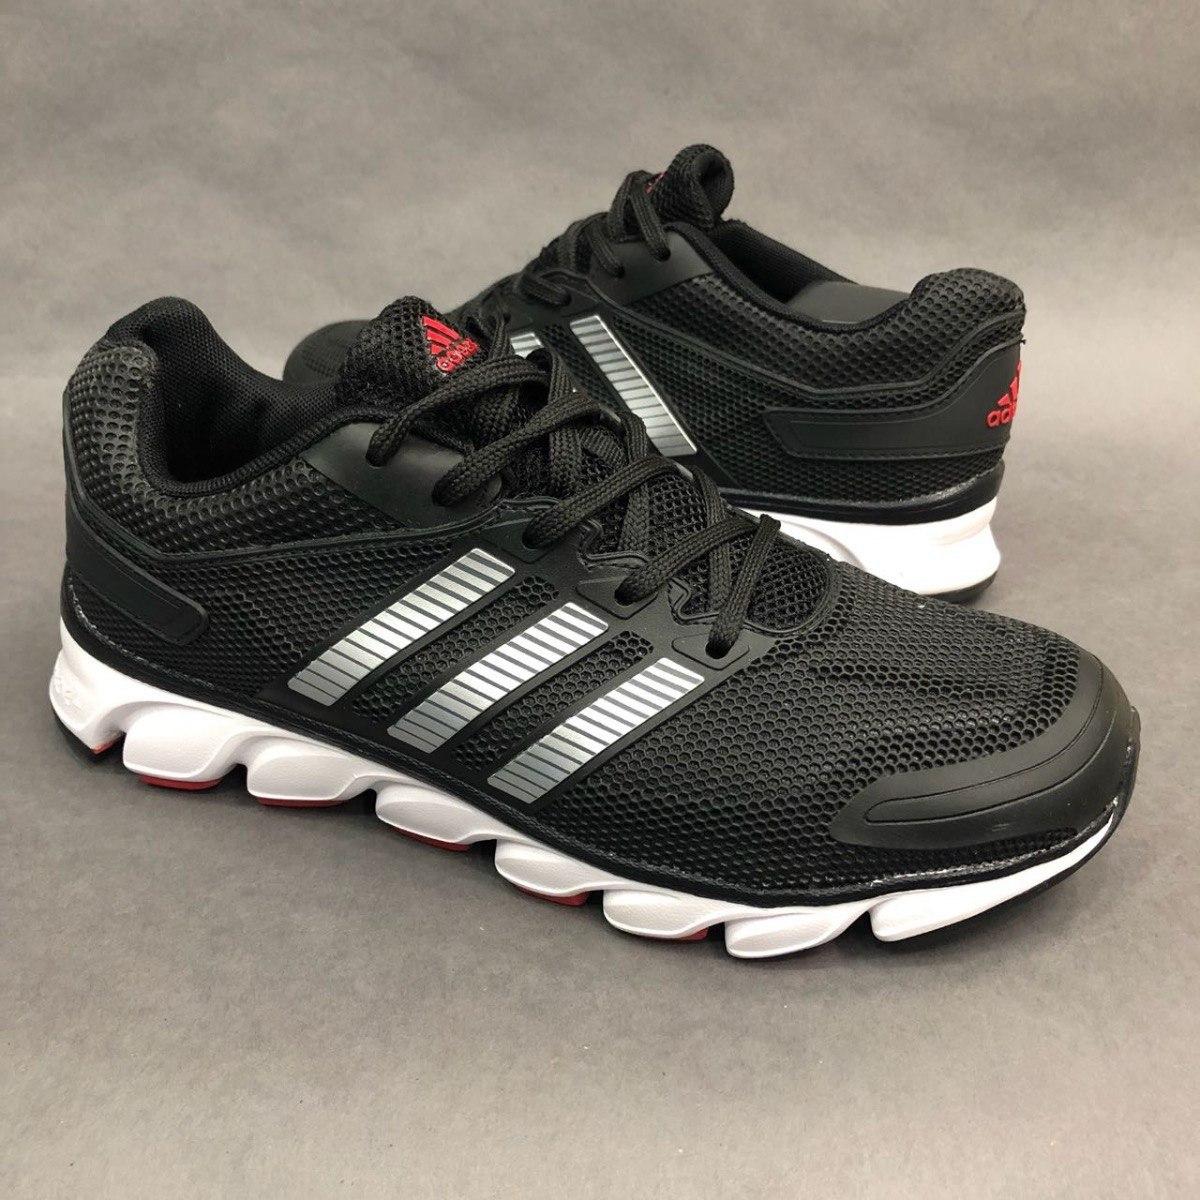 new arrivals acdfe 4b0de ... discount tenis zapatillas adidas climacool ride negra blanca hombre. cargando  zoom. a4e19 68ba2